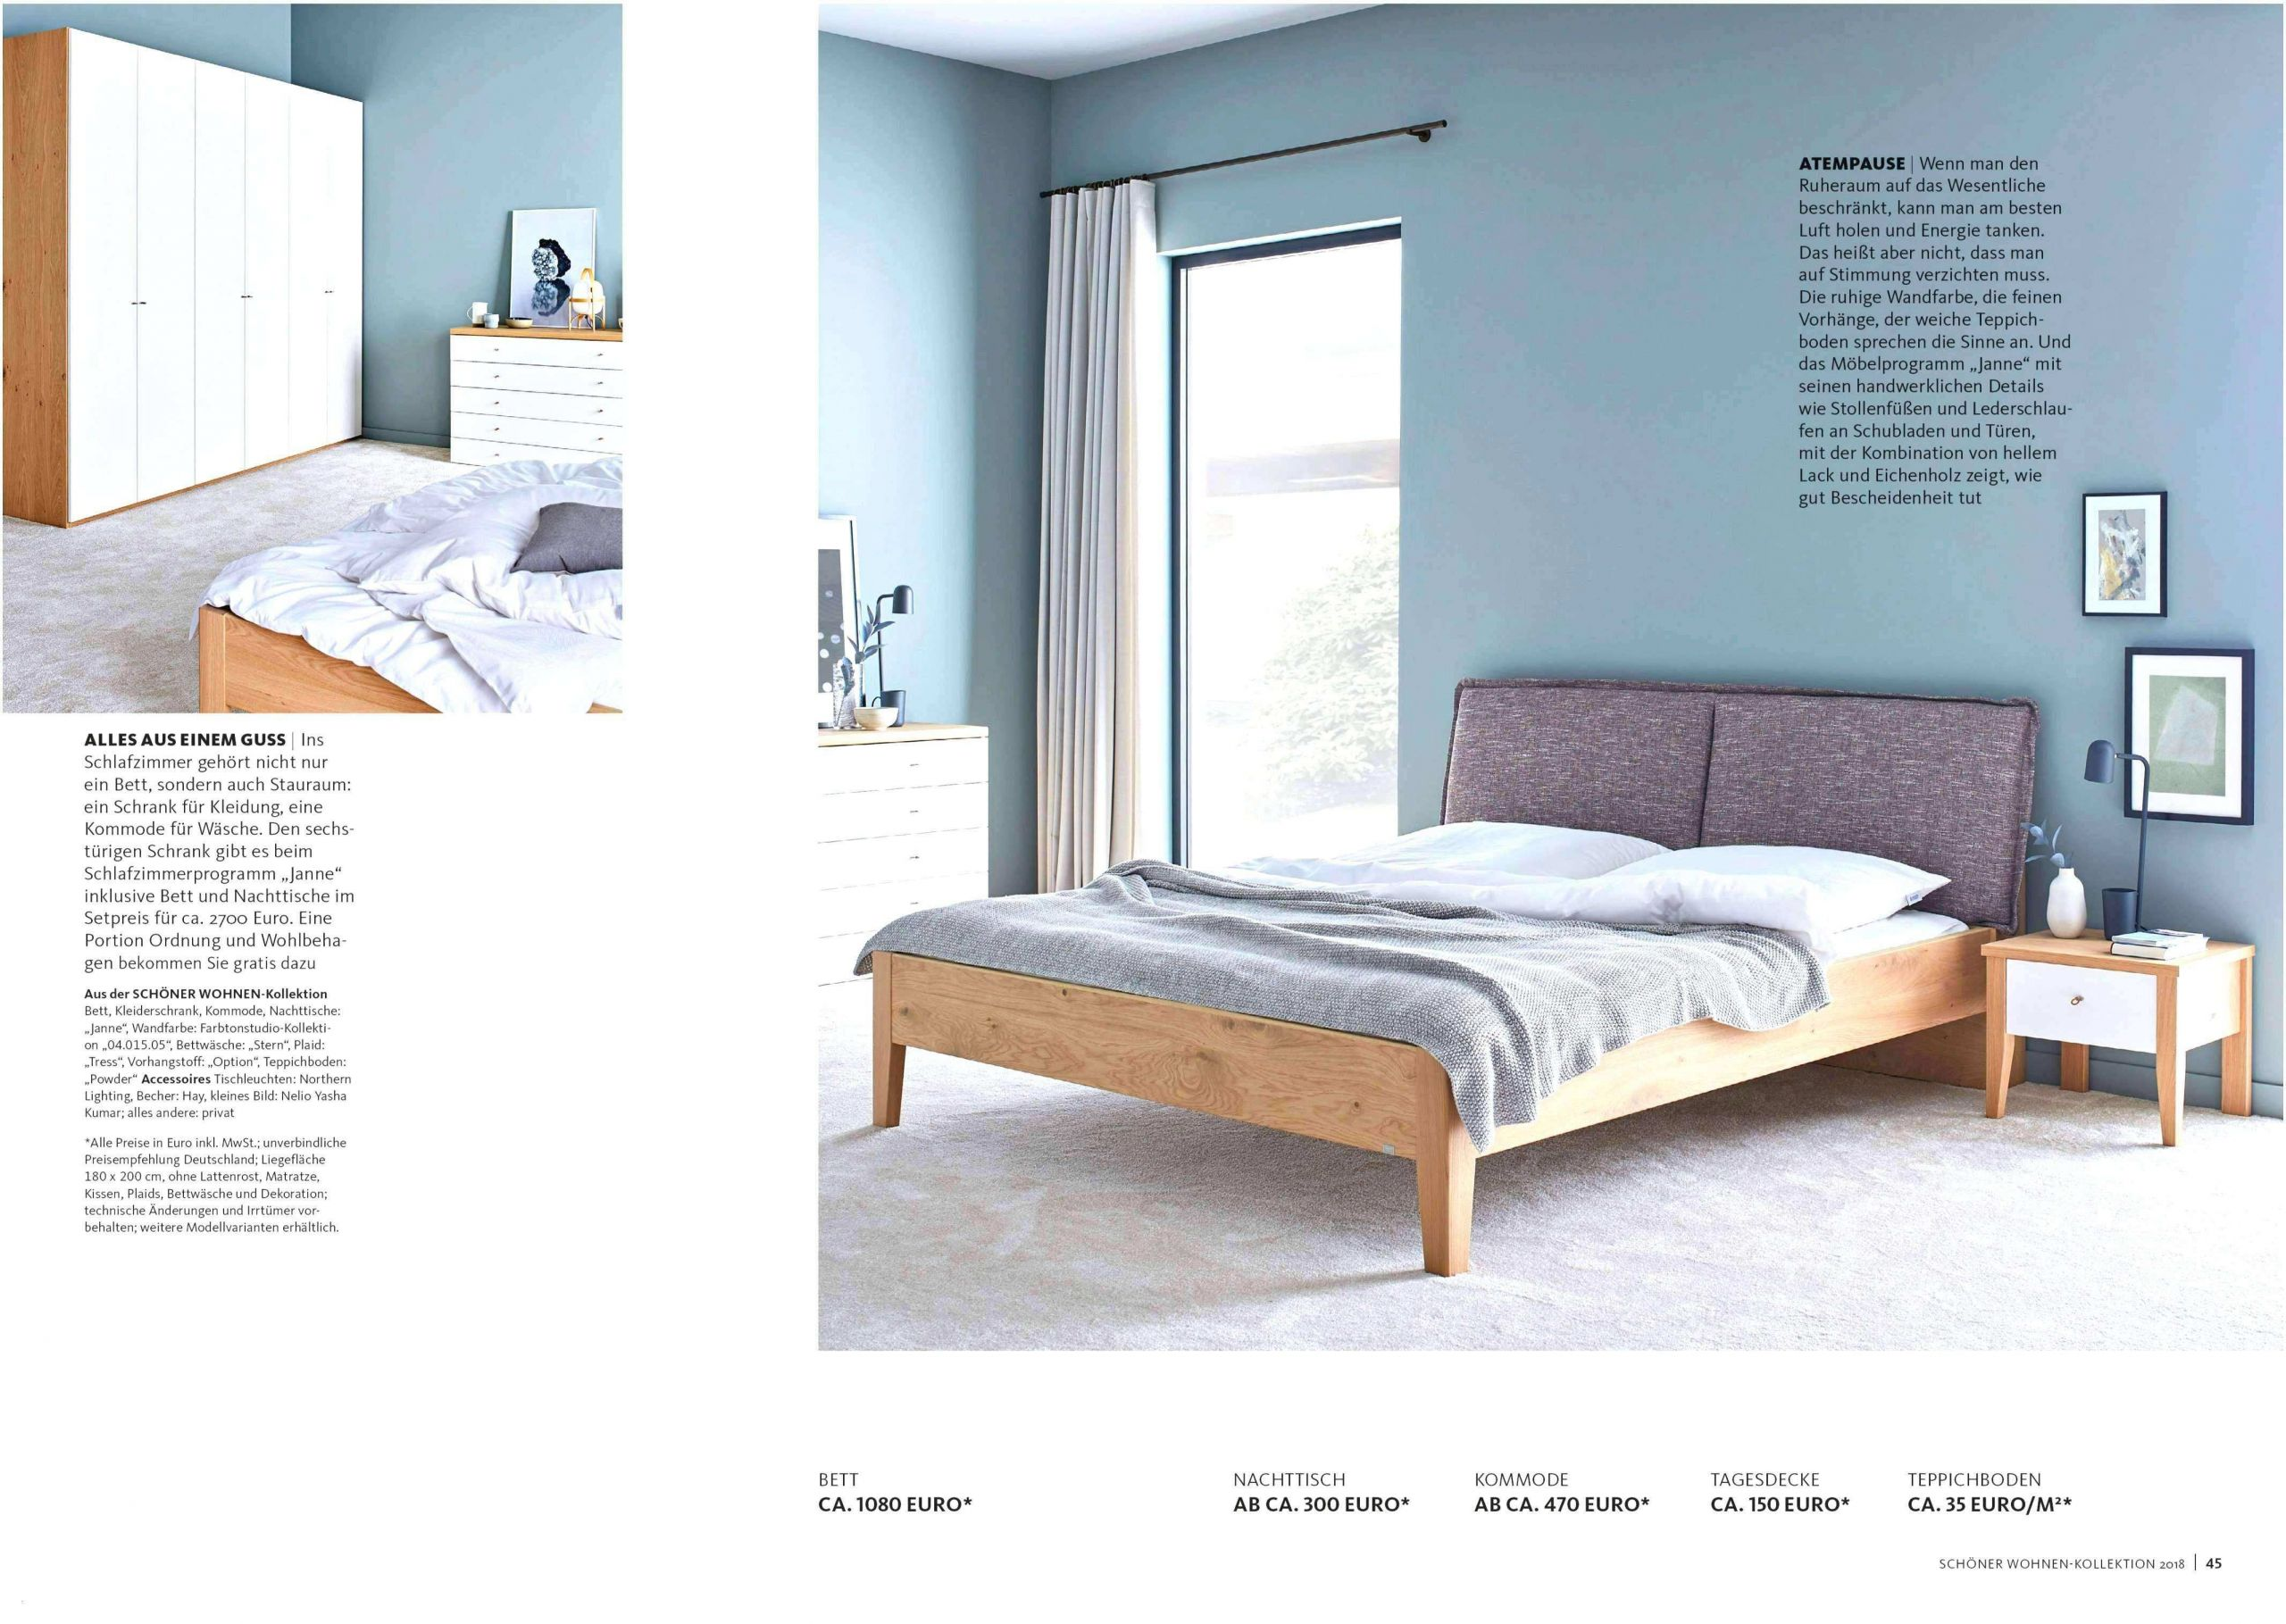 Deko Ideen Für Den Garten Elegant Deko Ideen Für Wohnzimmer Neu Für Wohnzimmer Deko Luxus